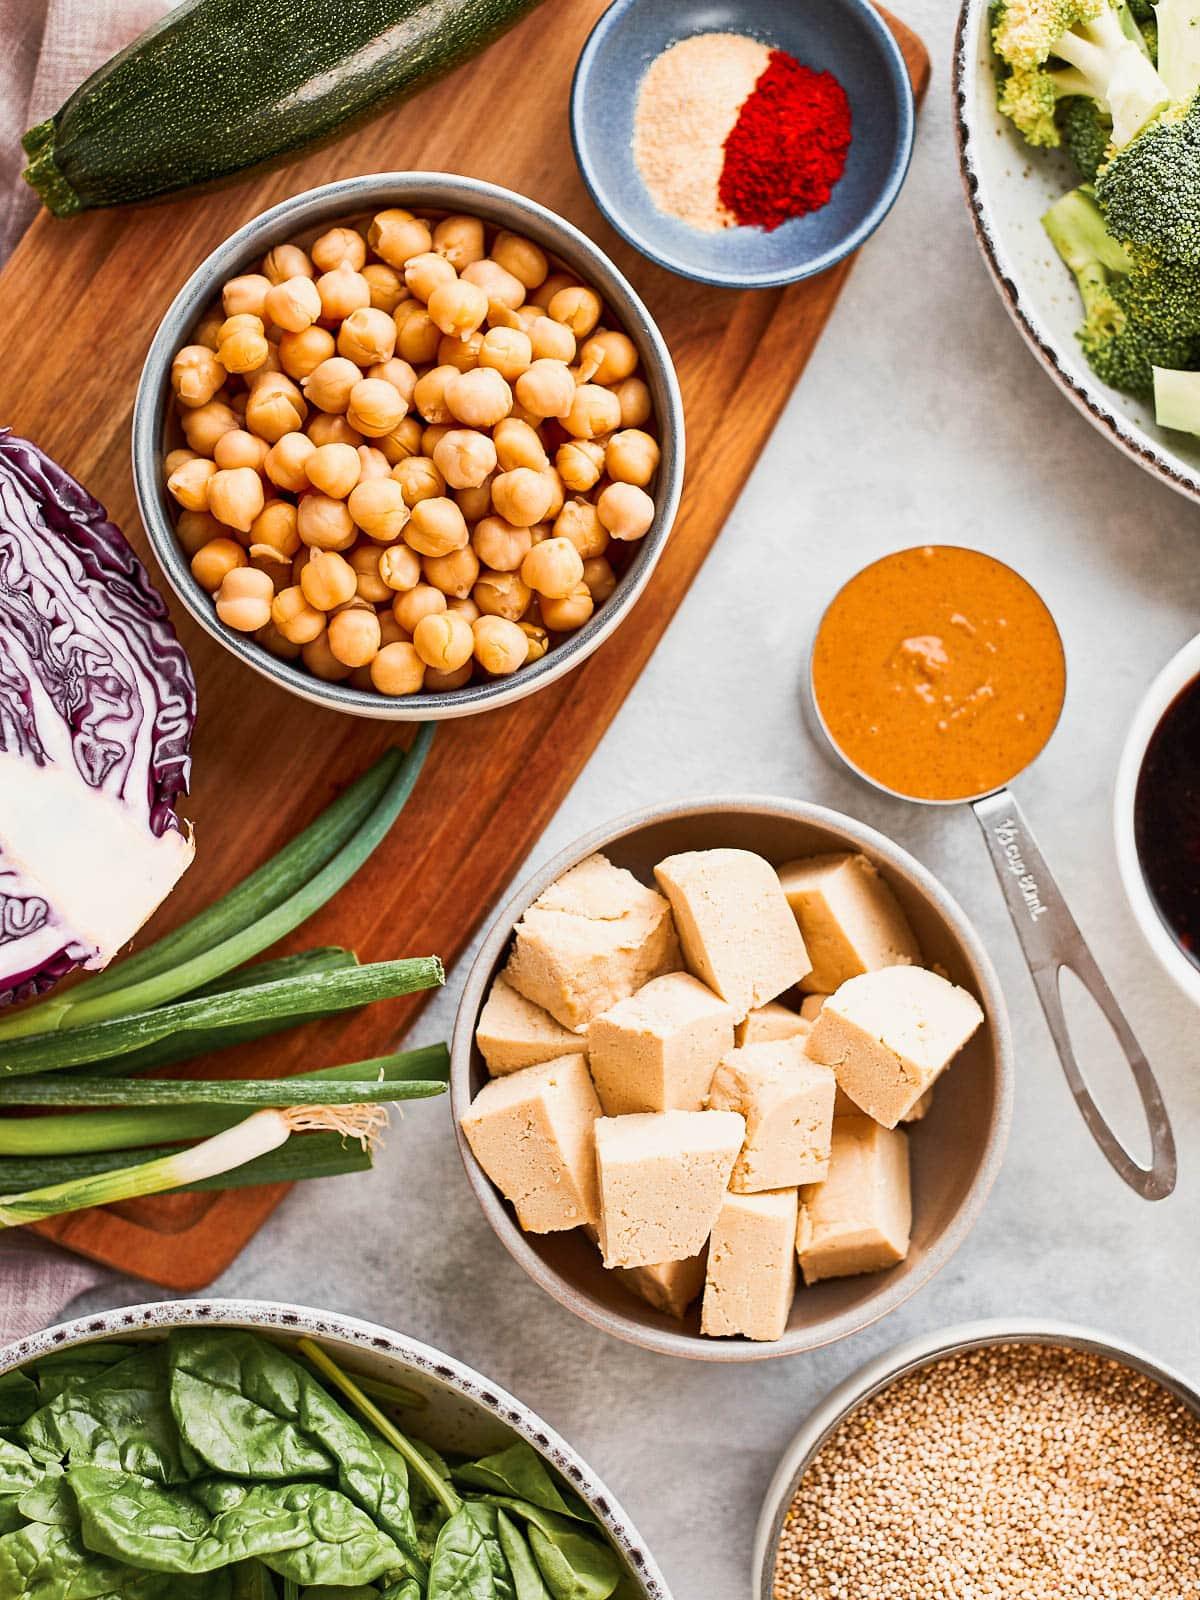 Ingredients for tofu buddha bowls